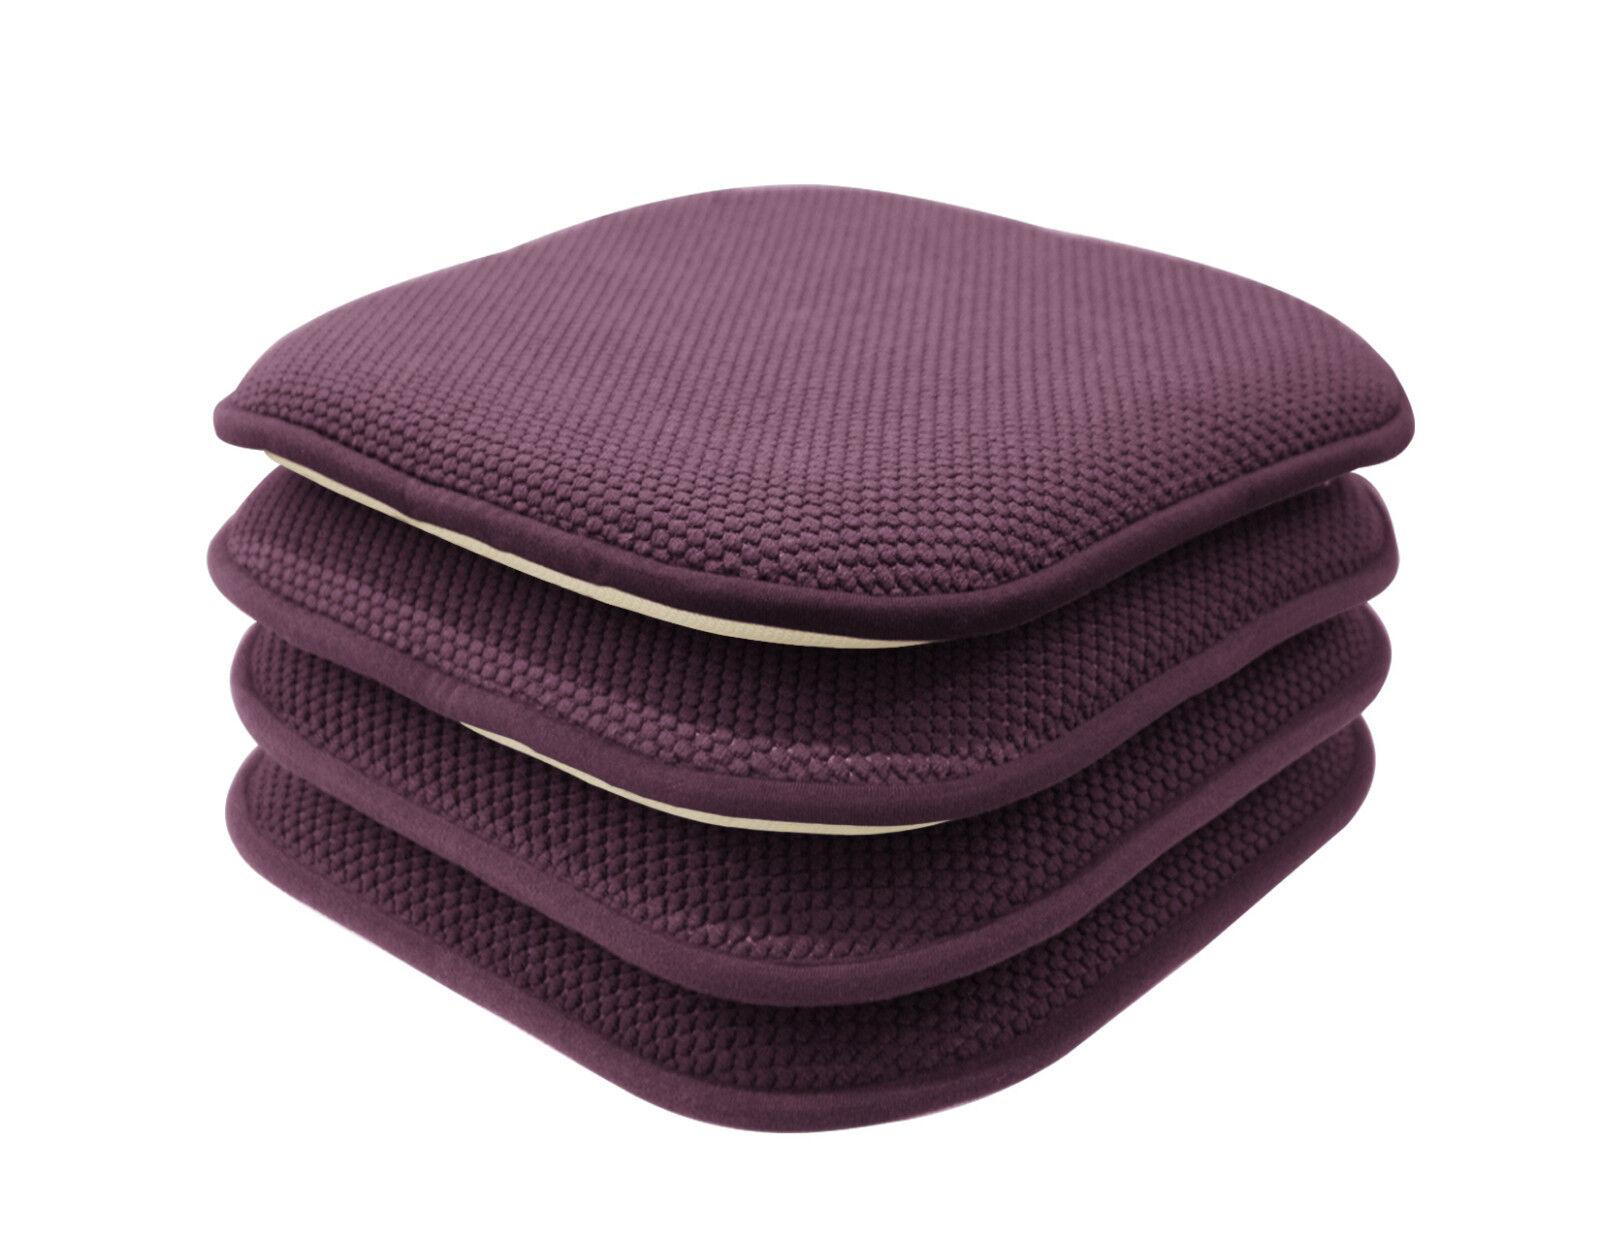 4 Pack: Non Slip Honeycomb Premium Memory Foam Chair Cushions   Assorted  Colors